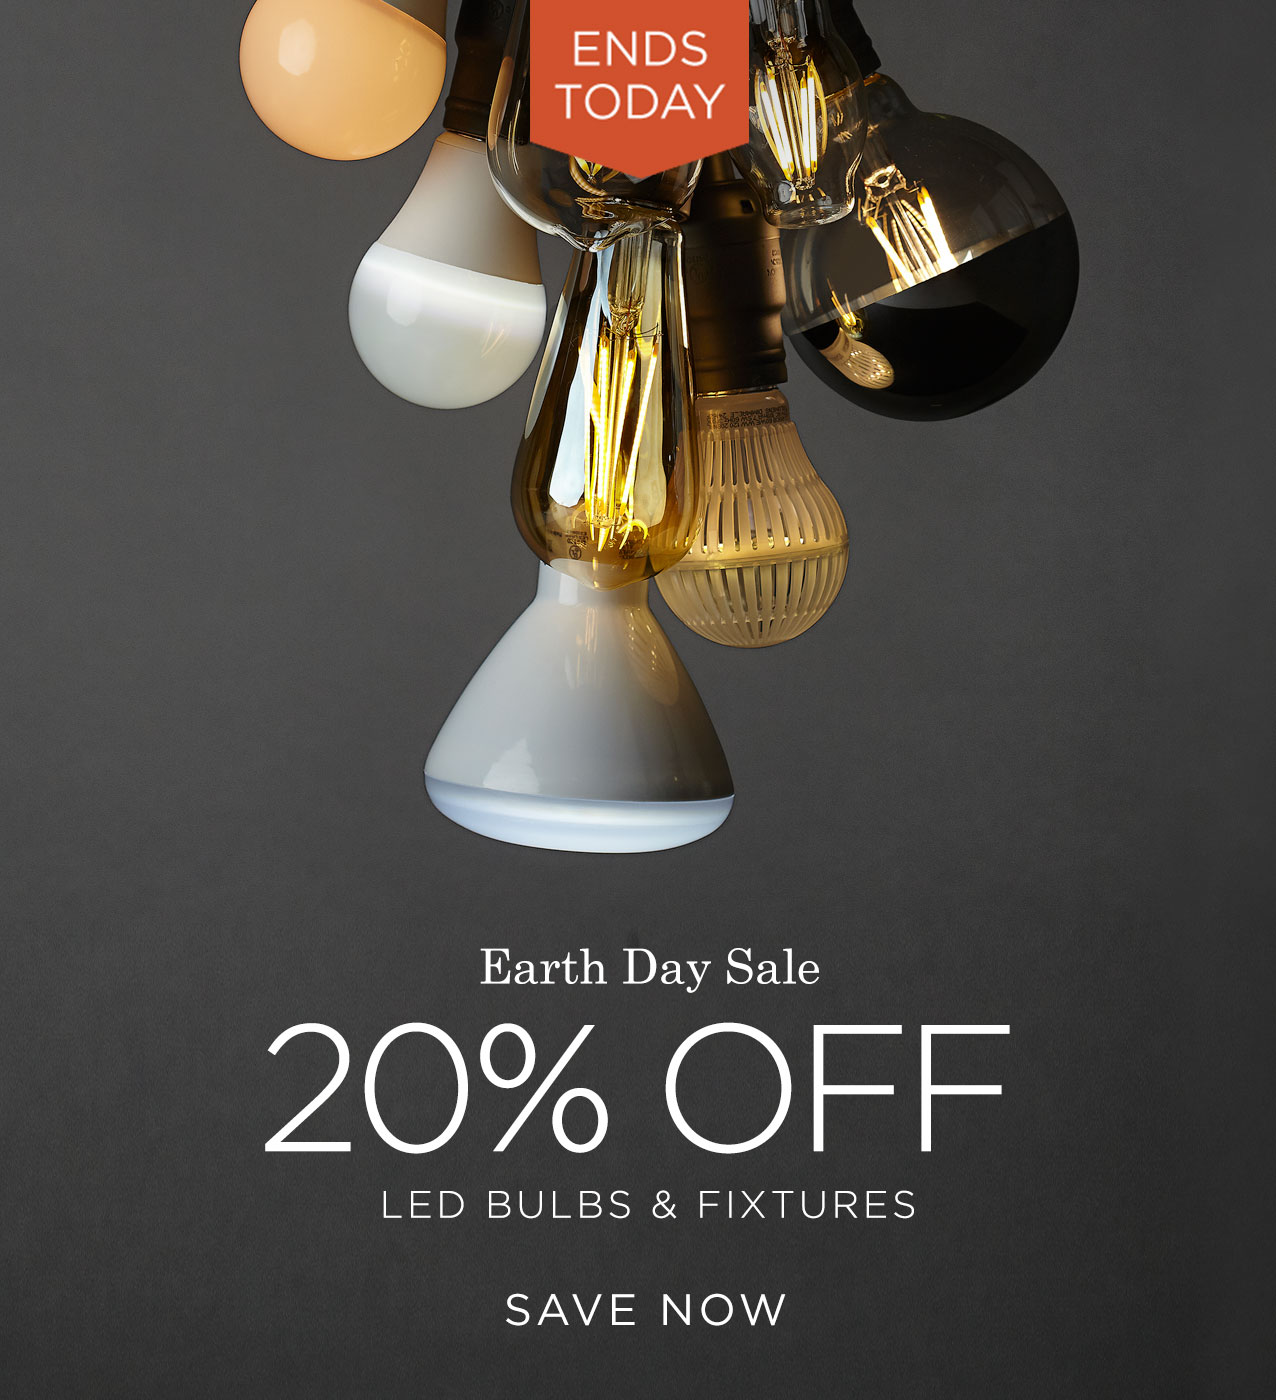 Earth Day Sale: Save 20% off LED Light Bulbs & Fixtures